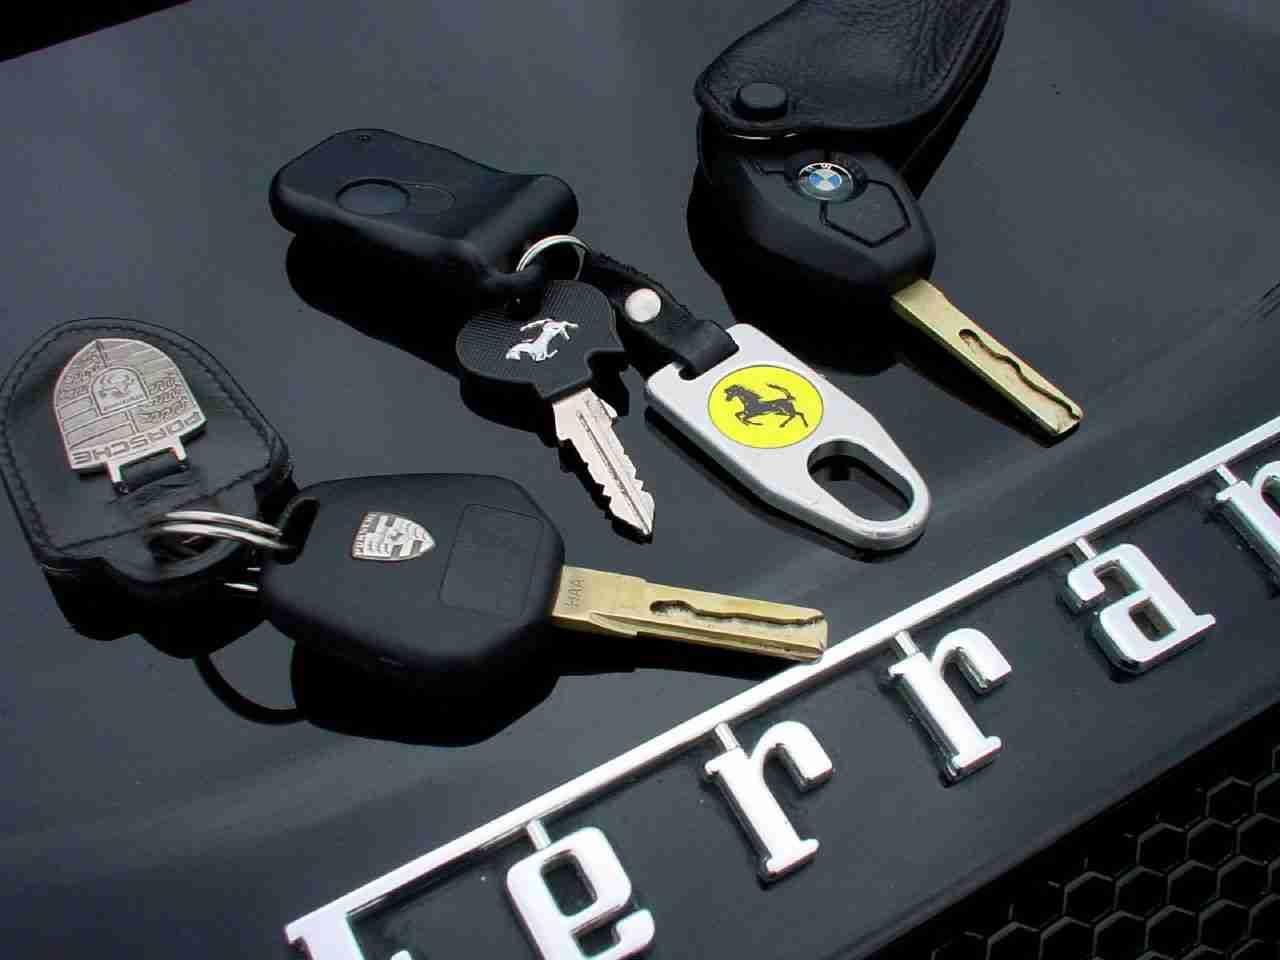 Keys at a Close Distance